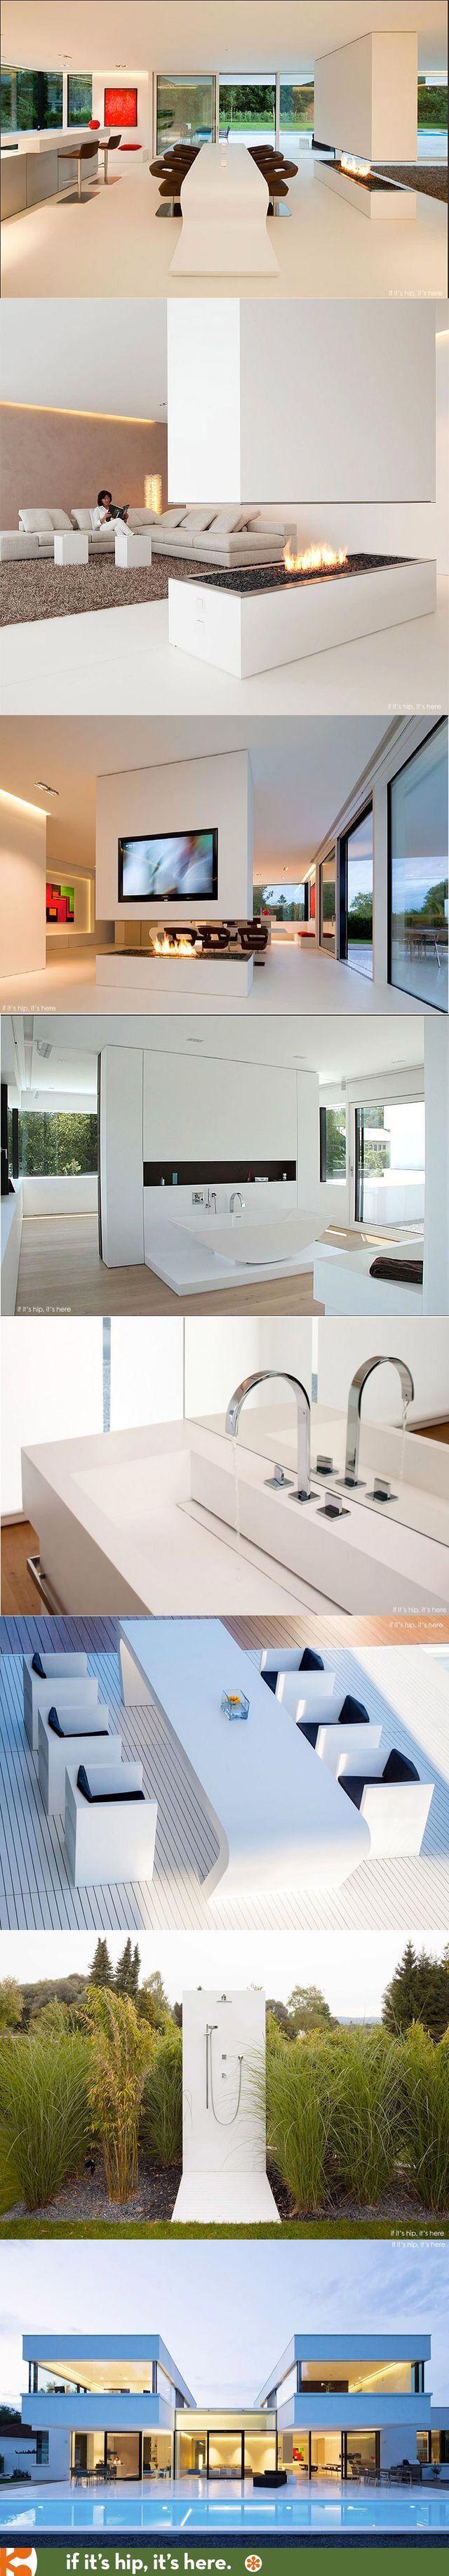 Harry potter stil zimmer  best ideas images on pinterest  bedroom ideas future house